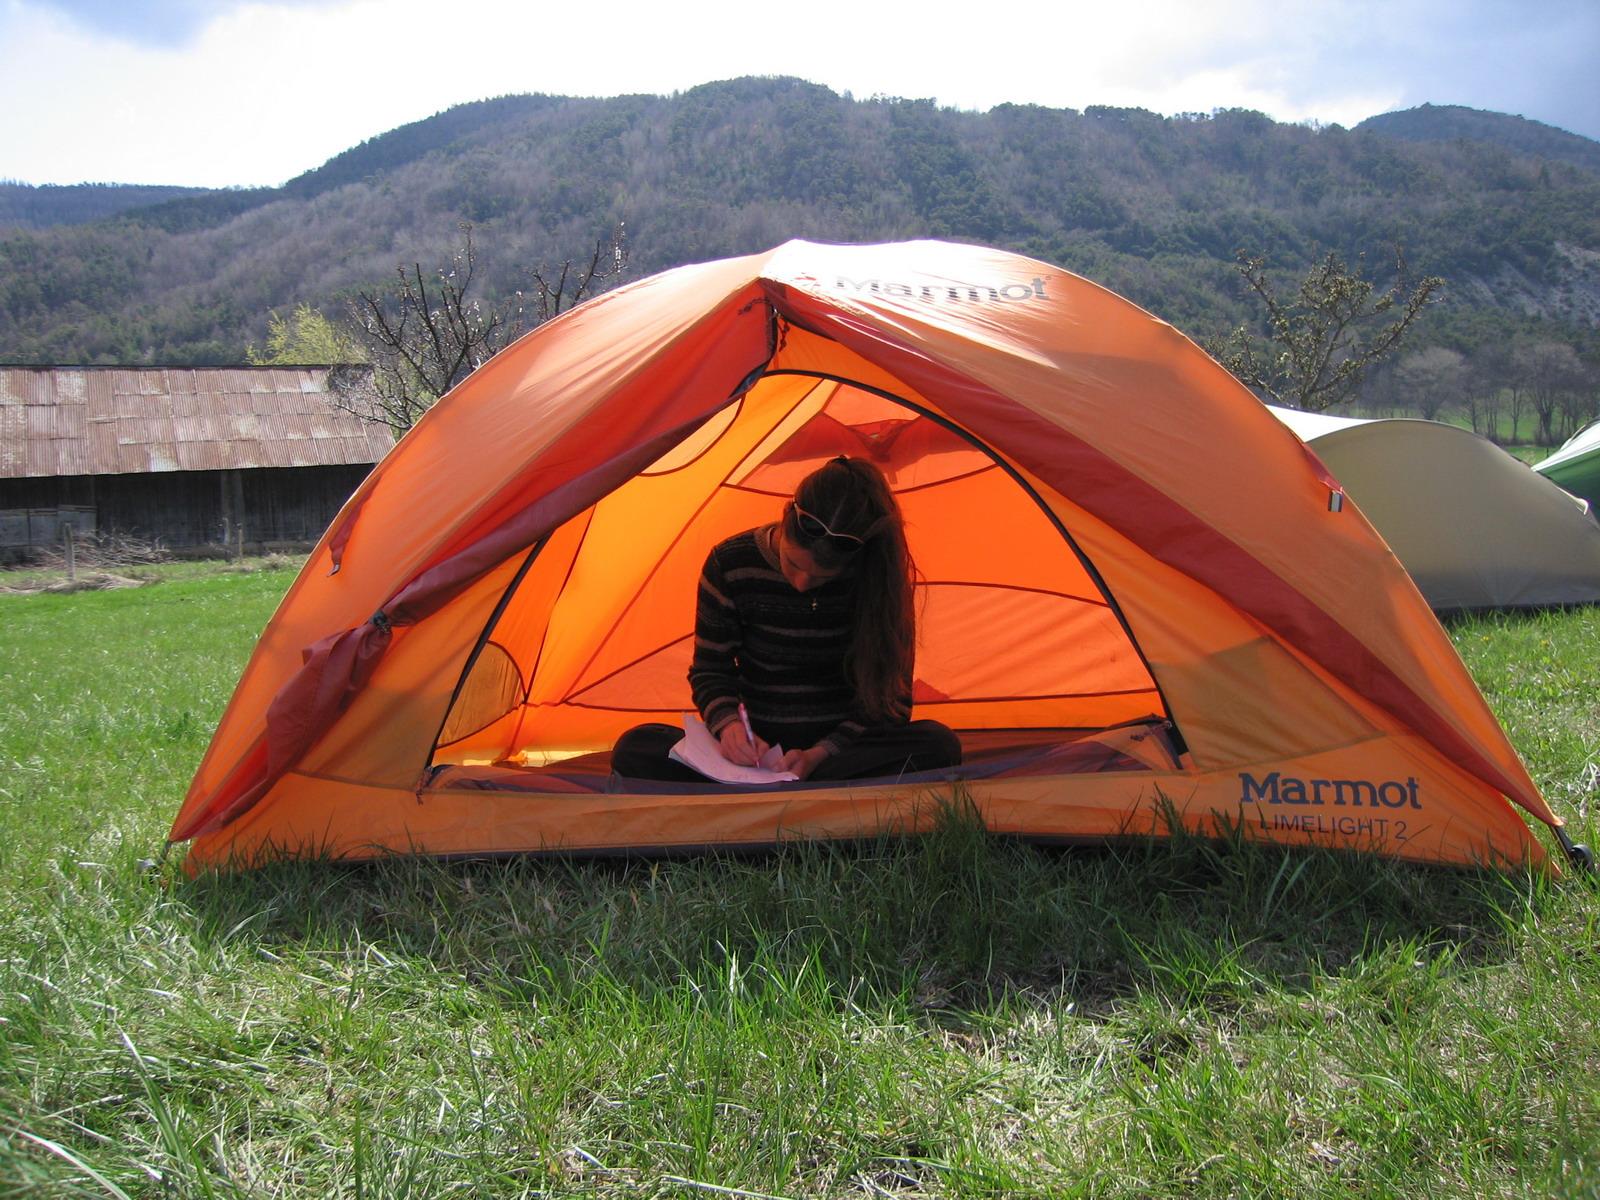 Tente Marmot Limelight 2P & Marmot Limelight 2P